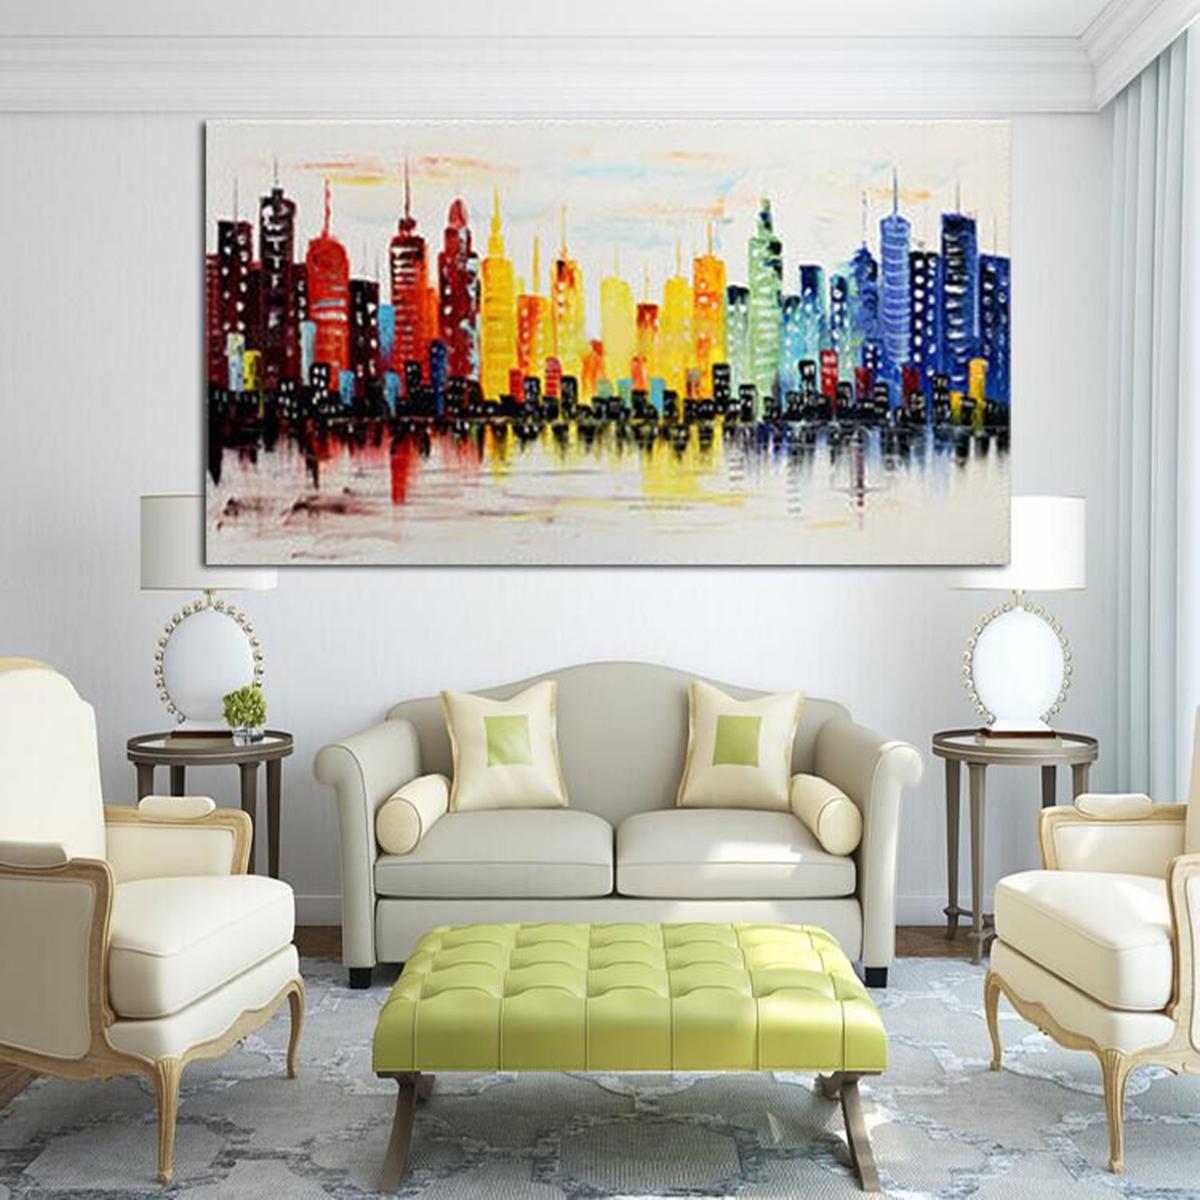 contemporary artwork living room yellow curtains modern paintings for 1 12 kaartenstemp nl 120x60cm city canvas abstract painting print art rh alexnld com